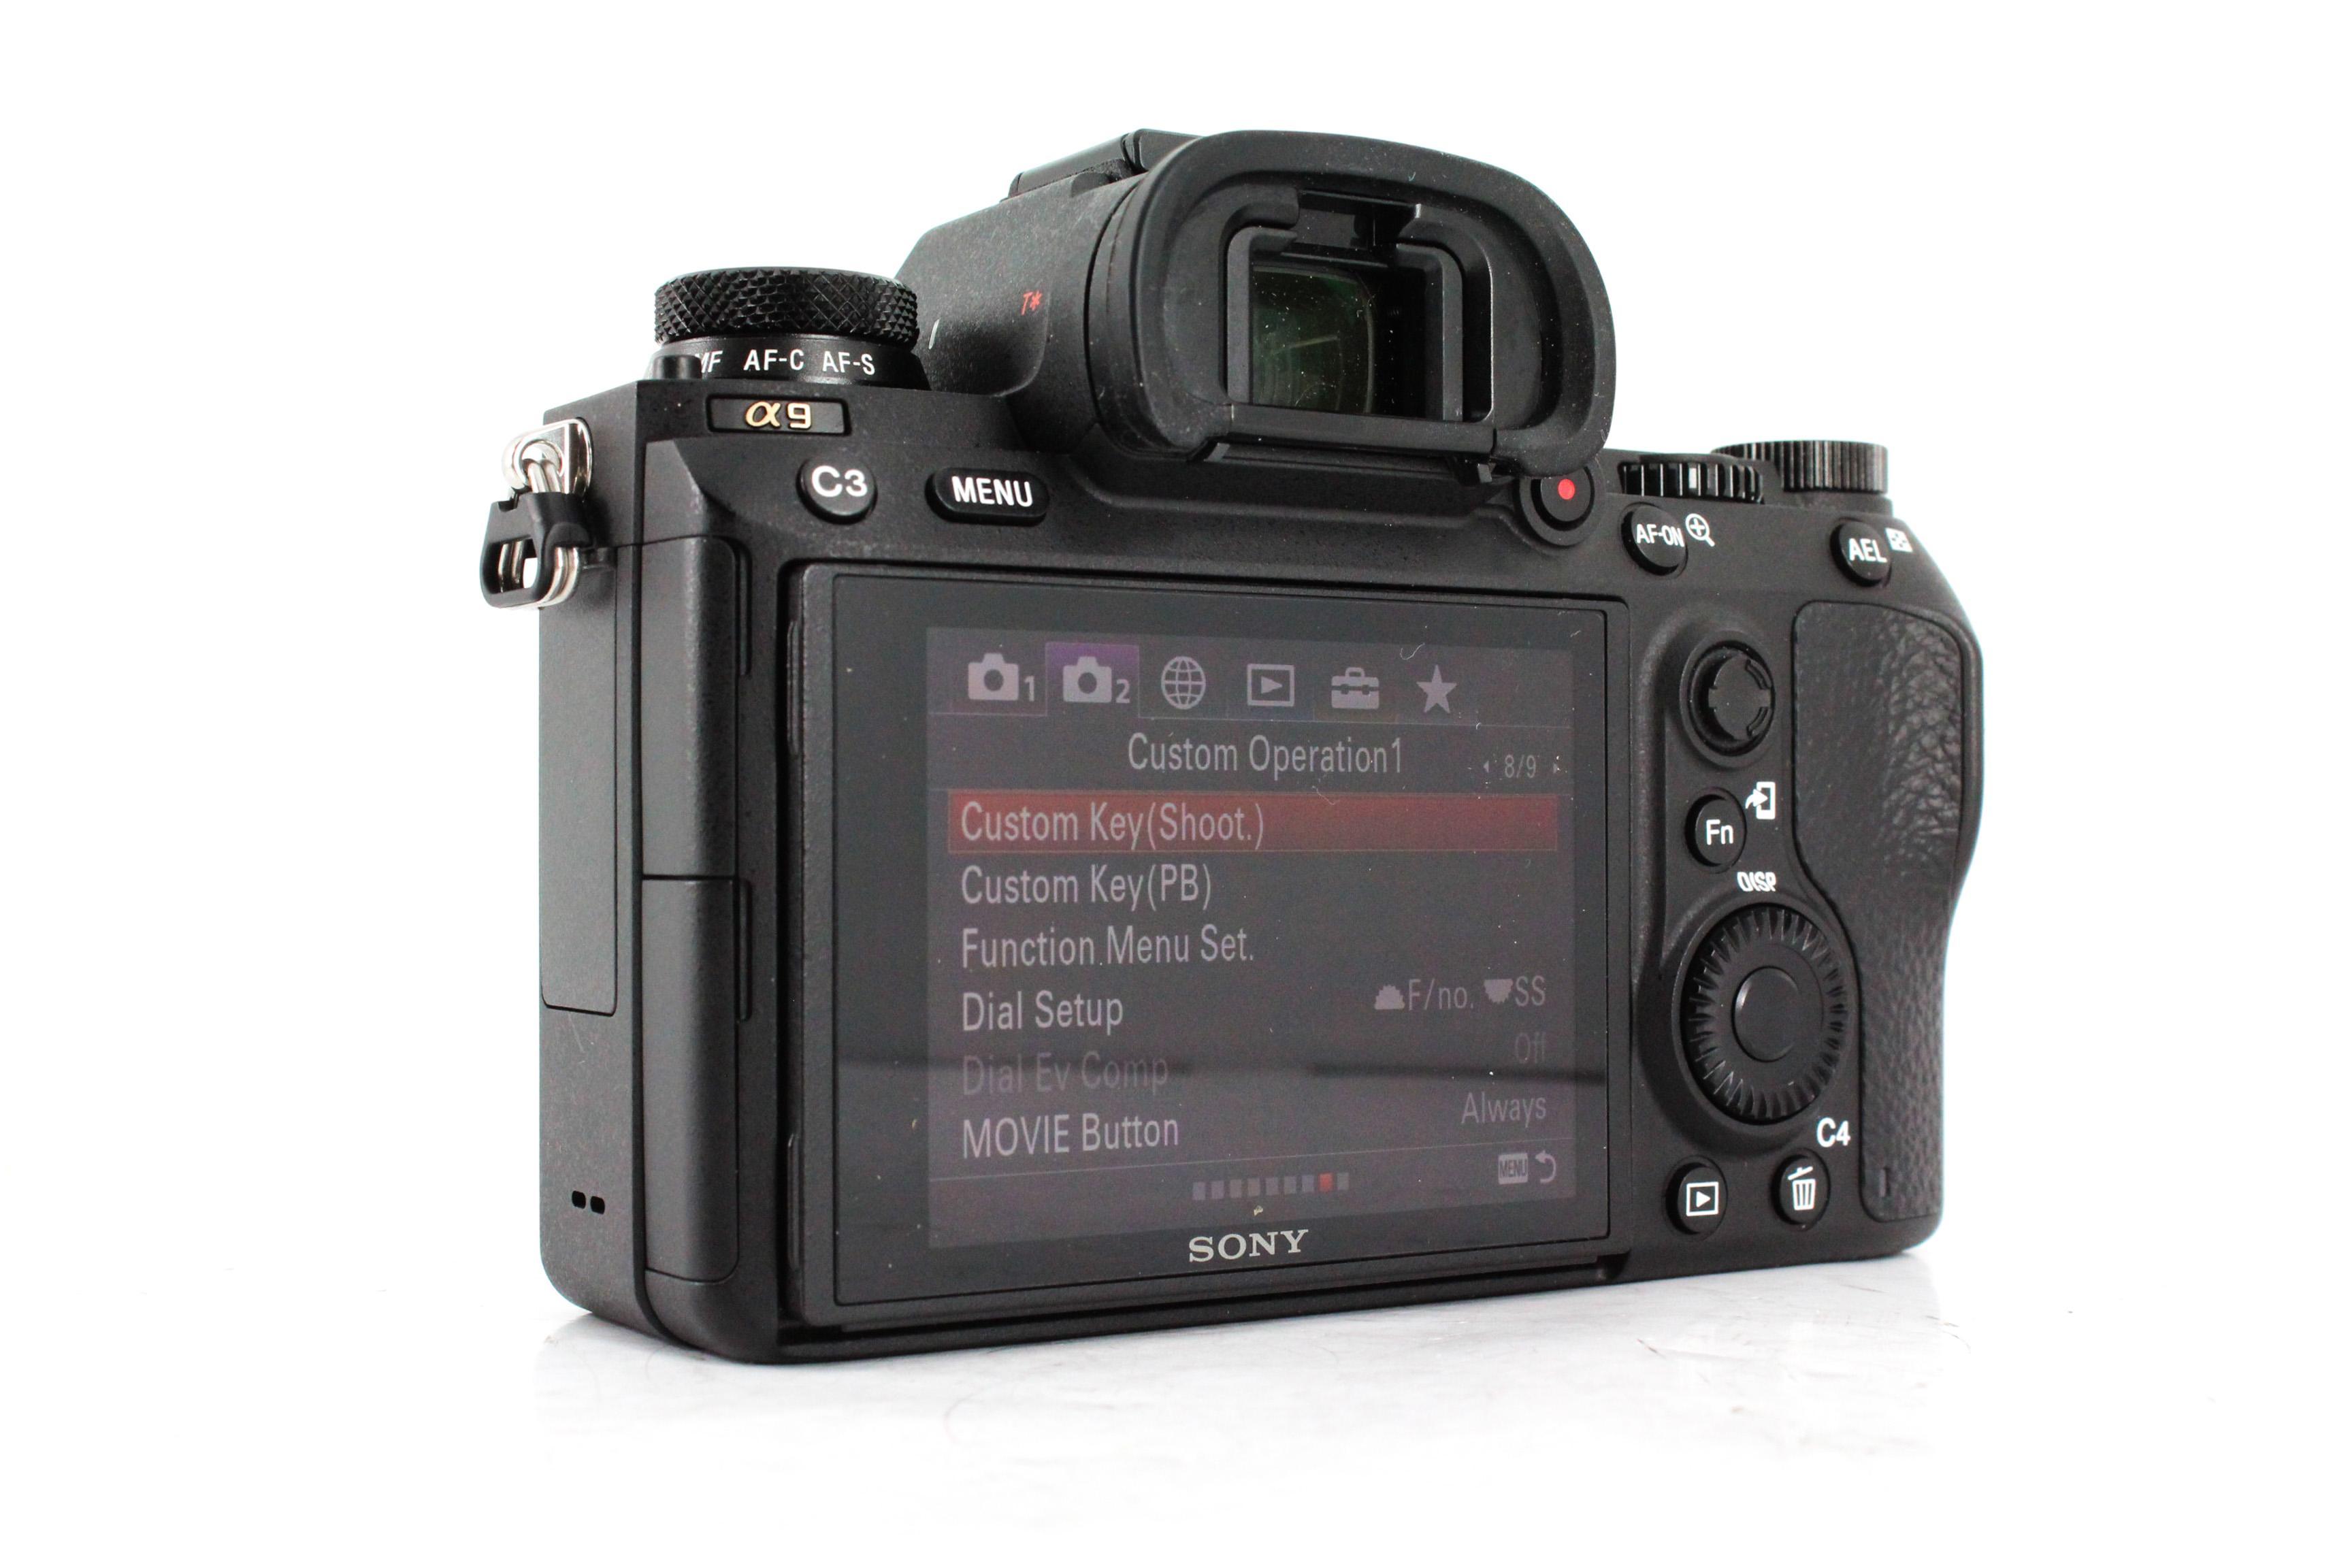 sony camera rumors image